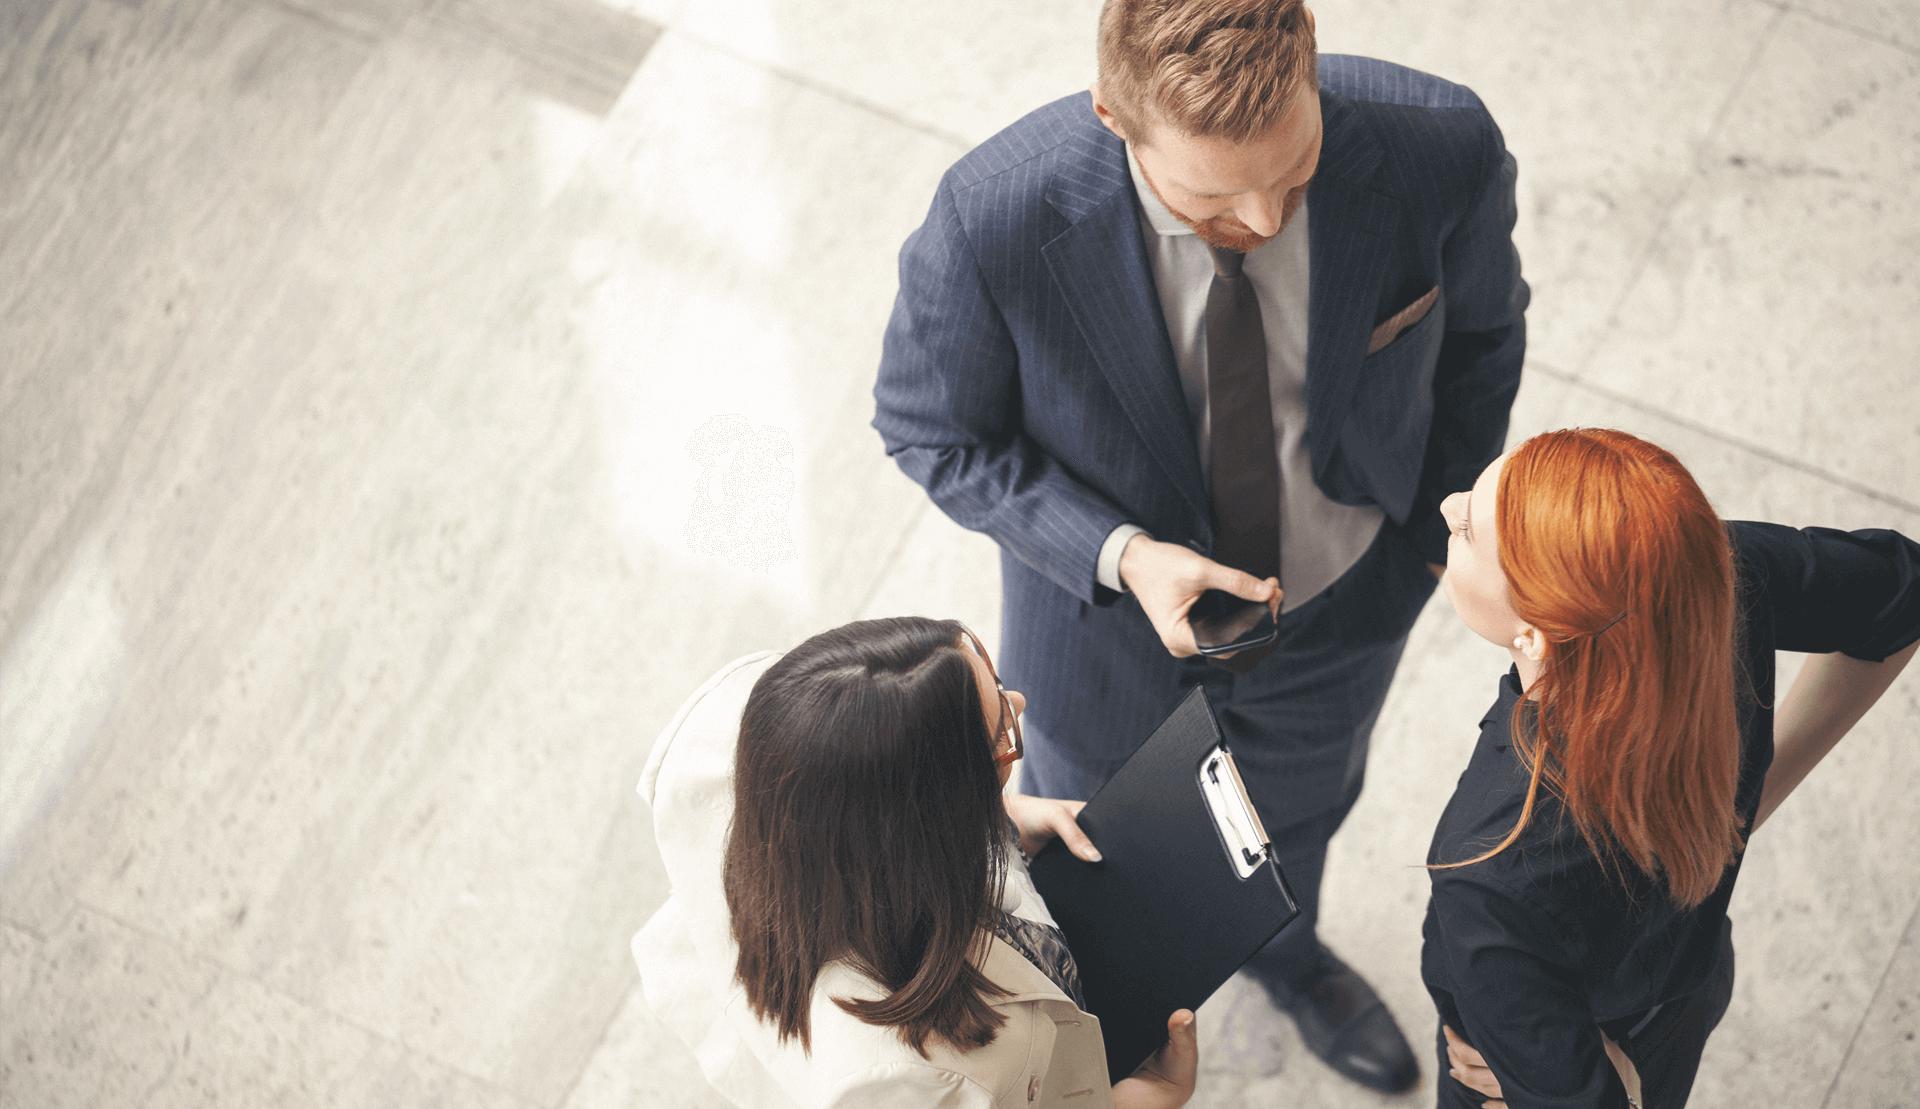 Intelligent Workforce Solution for Public Sector